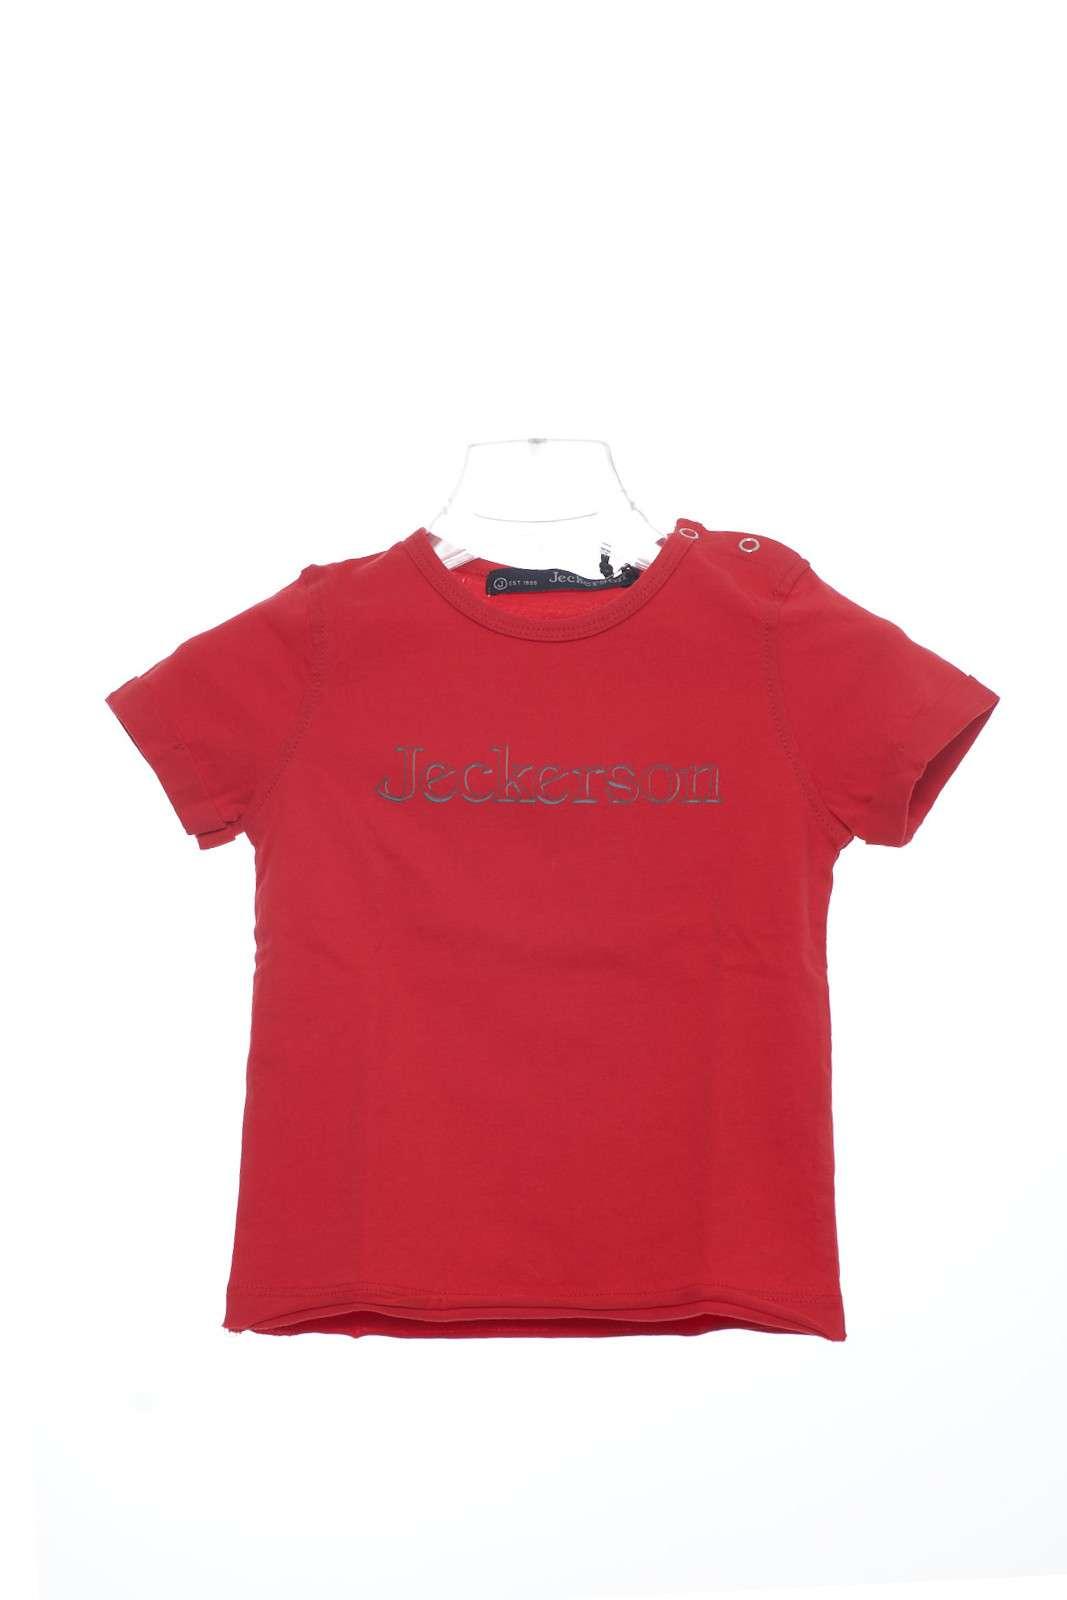 https://www.parmax.com/media/catalog/product/a/i/PE-outlet_parmax-maglia-bambino-Jeckerson-J518-A.jpg